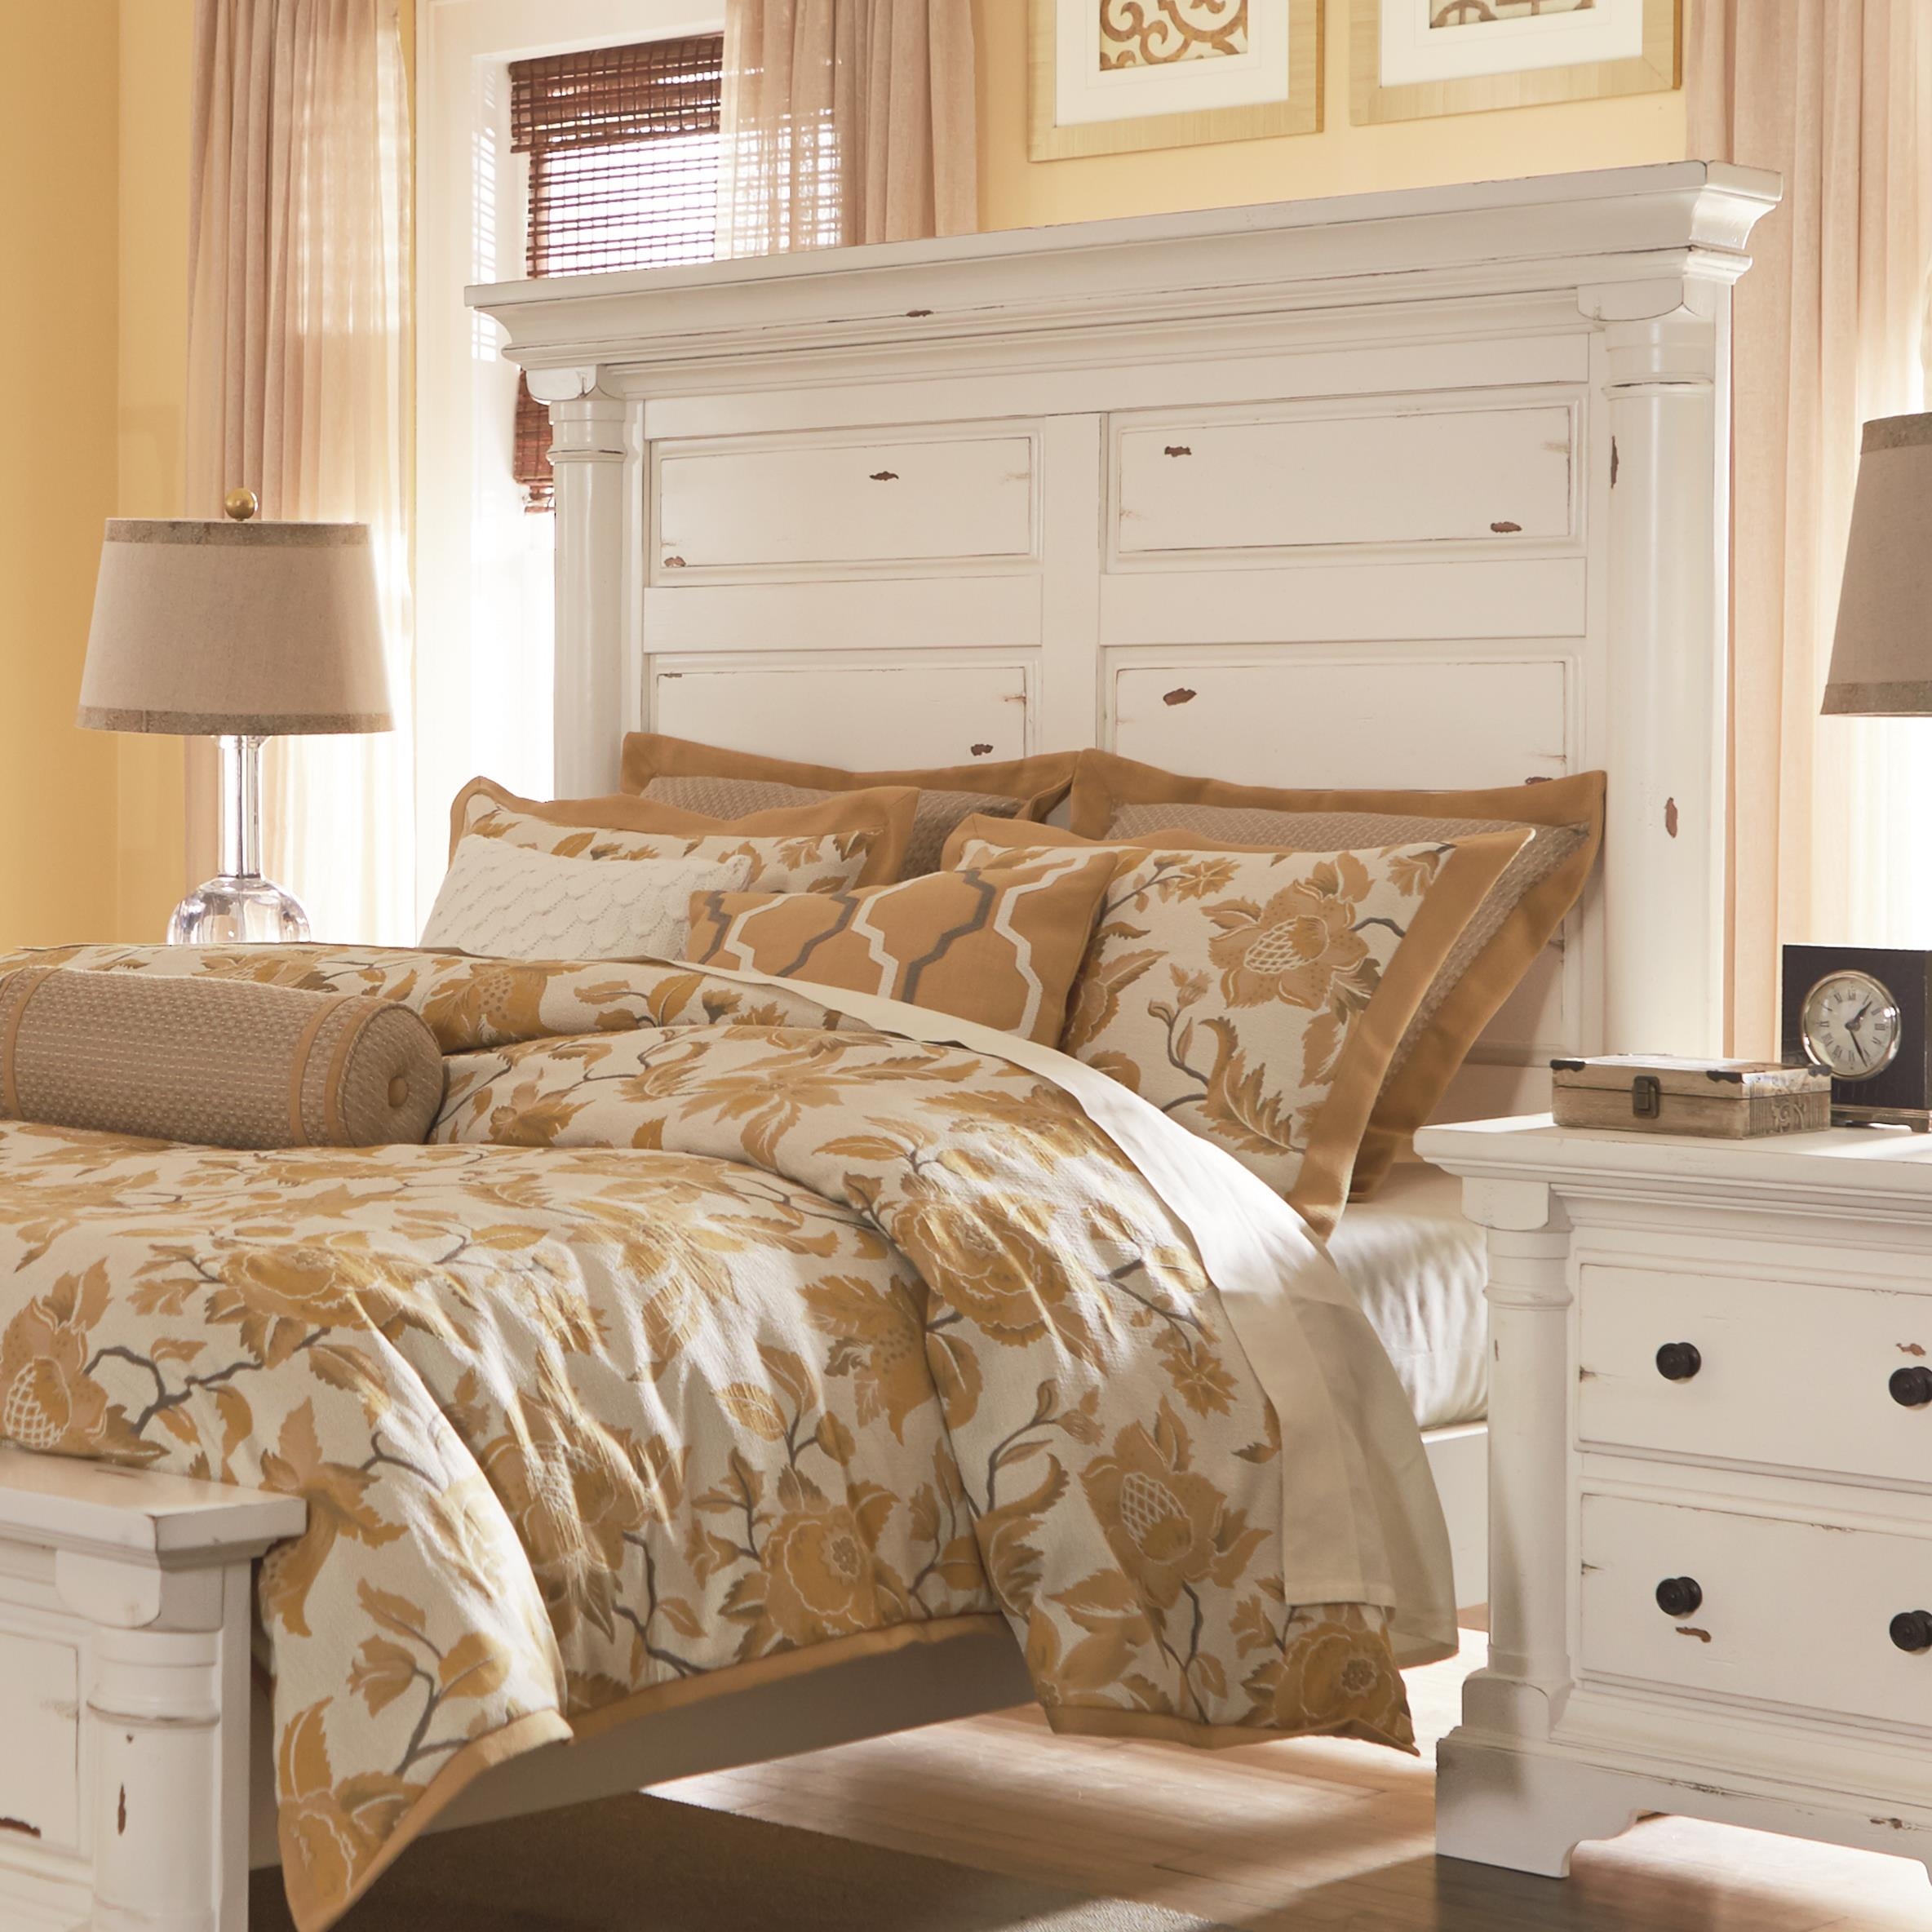 Progressive Furniture Gramercy Park King Panel Headboard - Item Number: P661-94